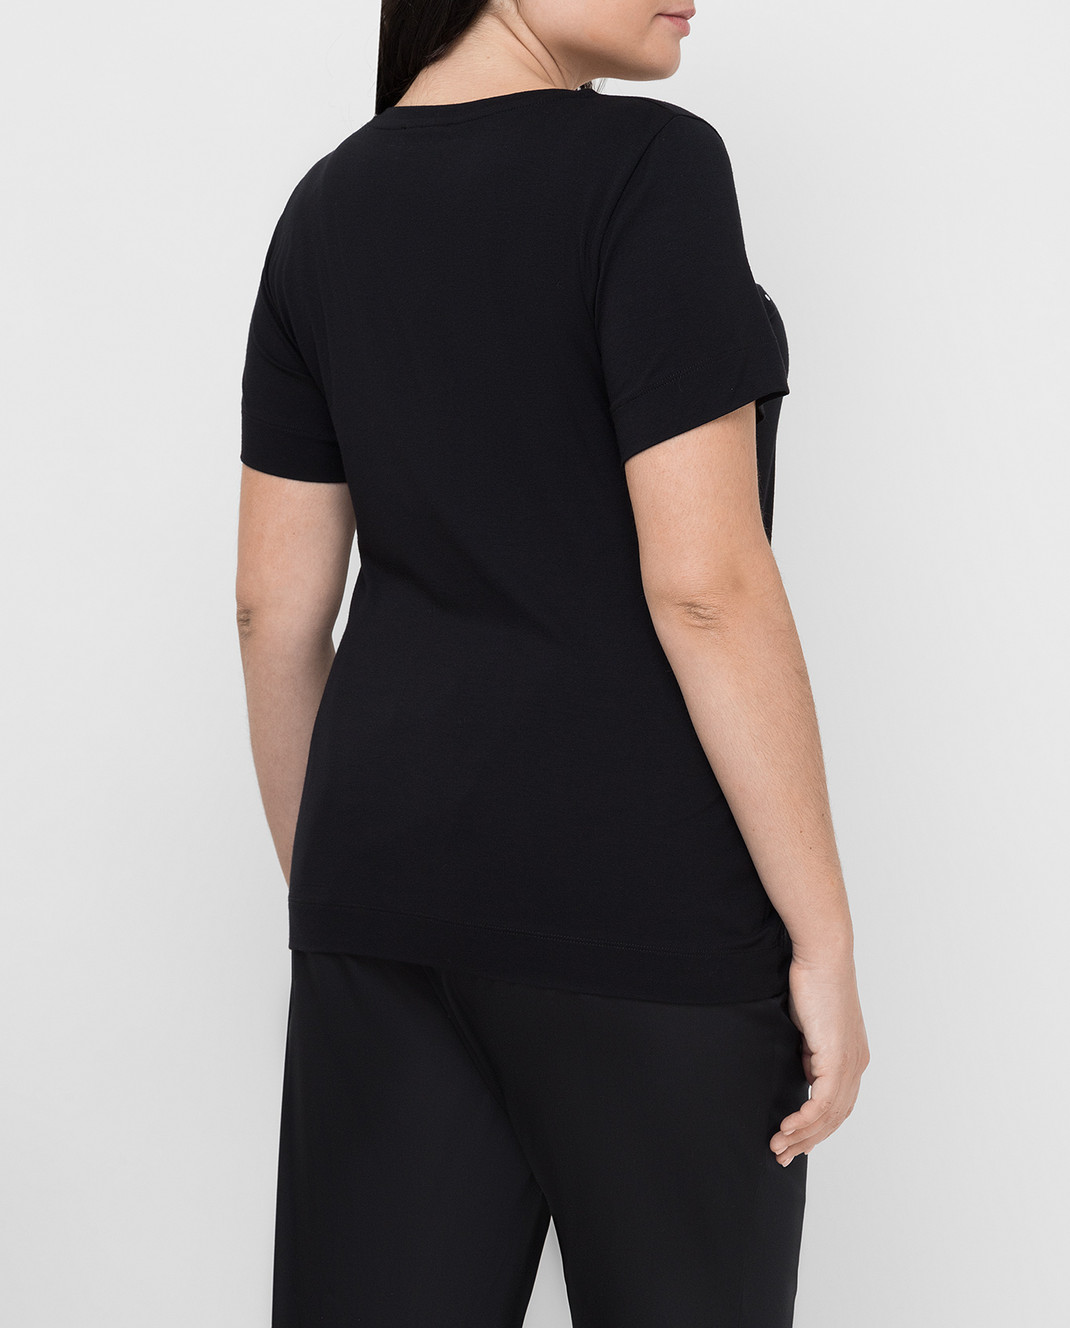 Marina Rinaldi Черная футболка VENTATA изображение 4